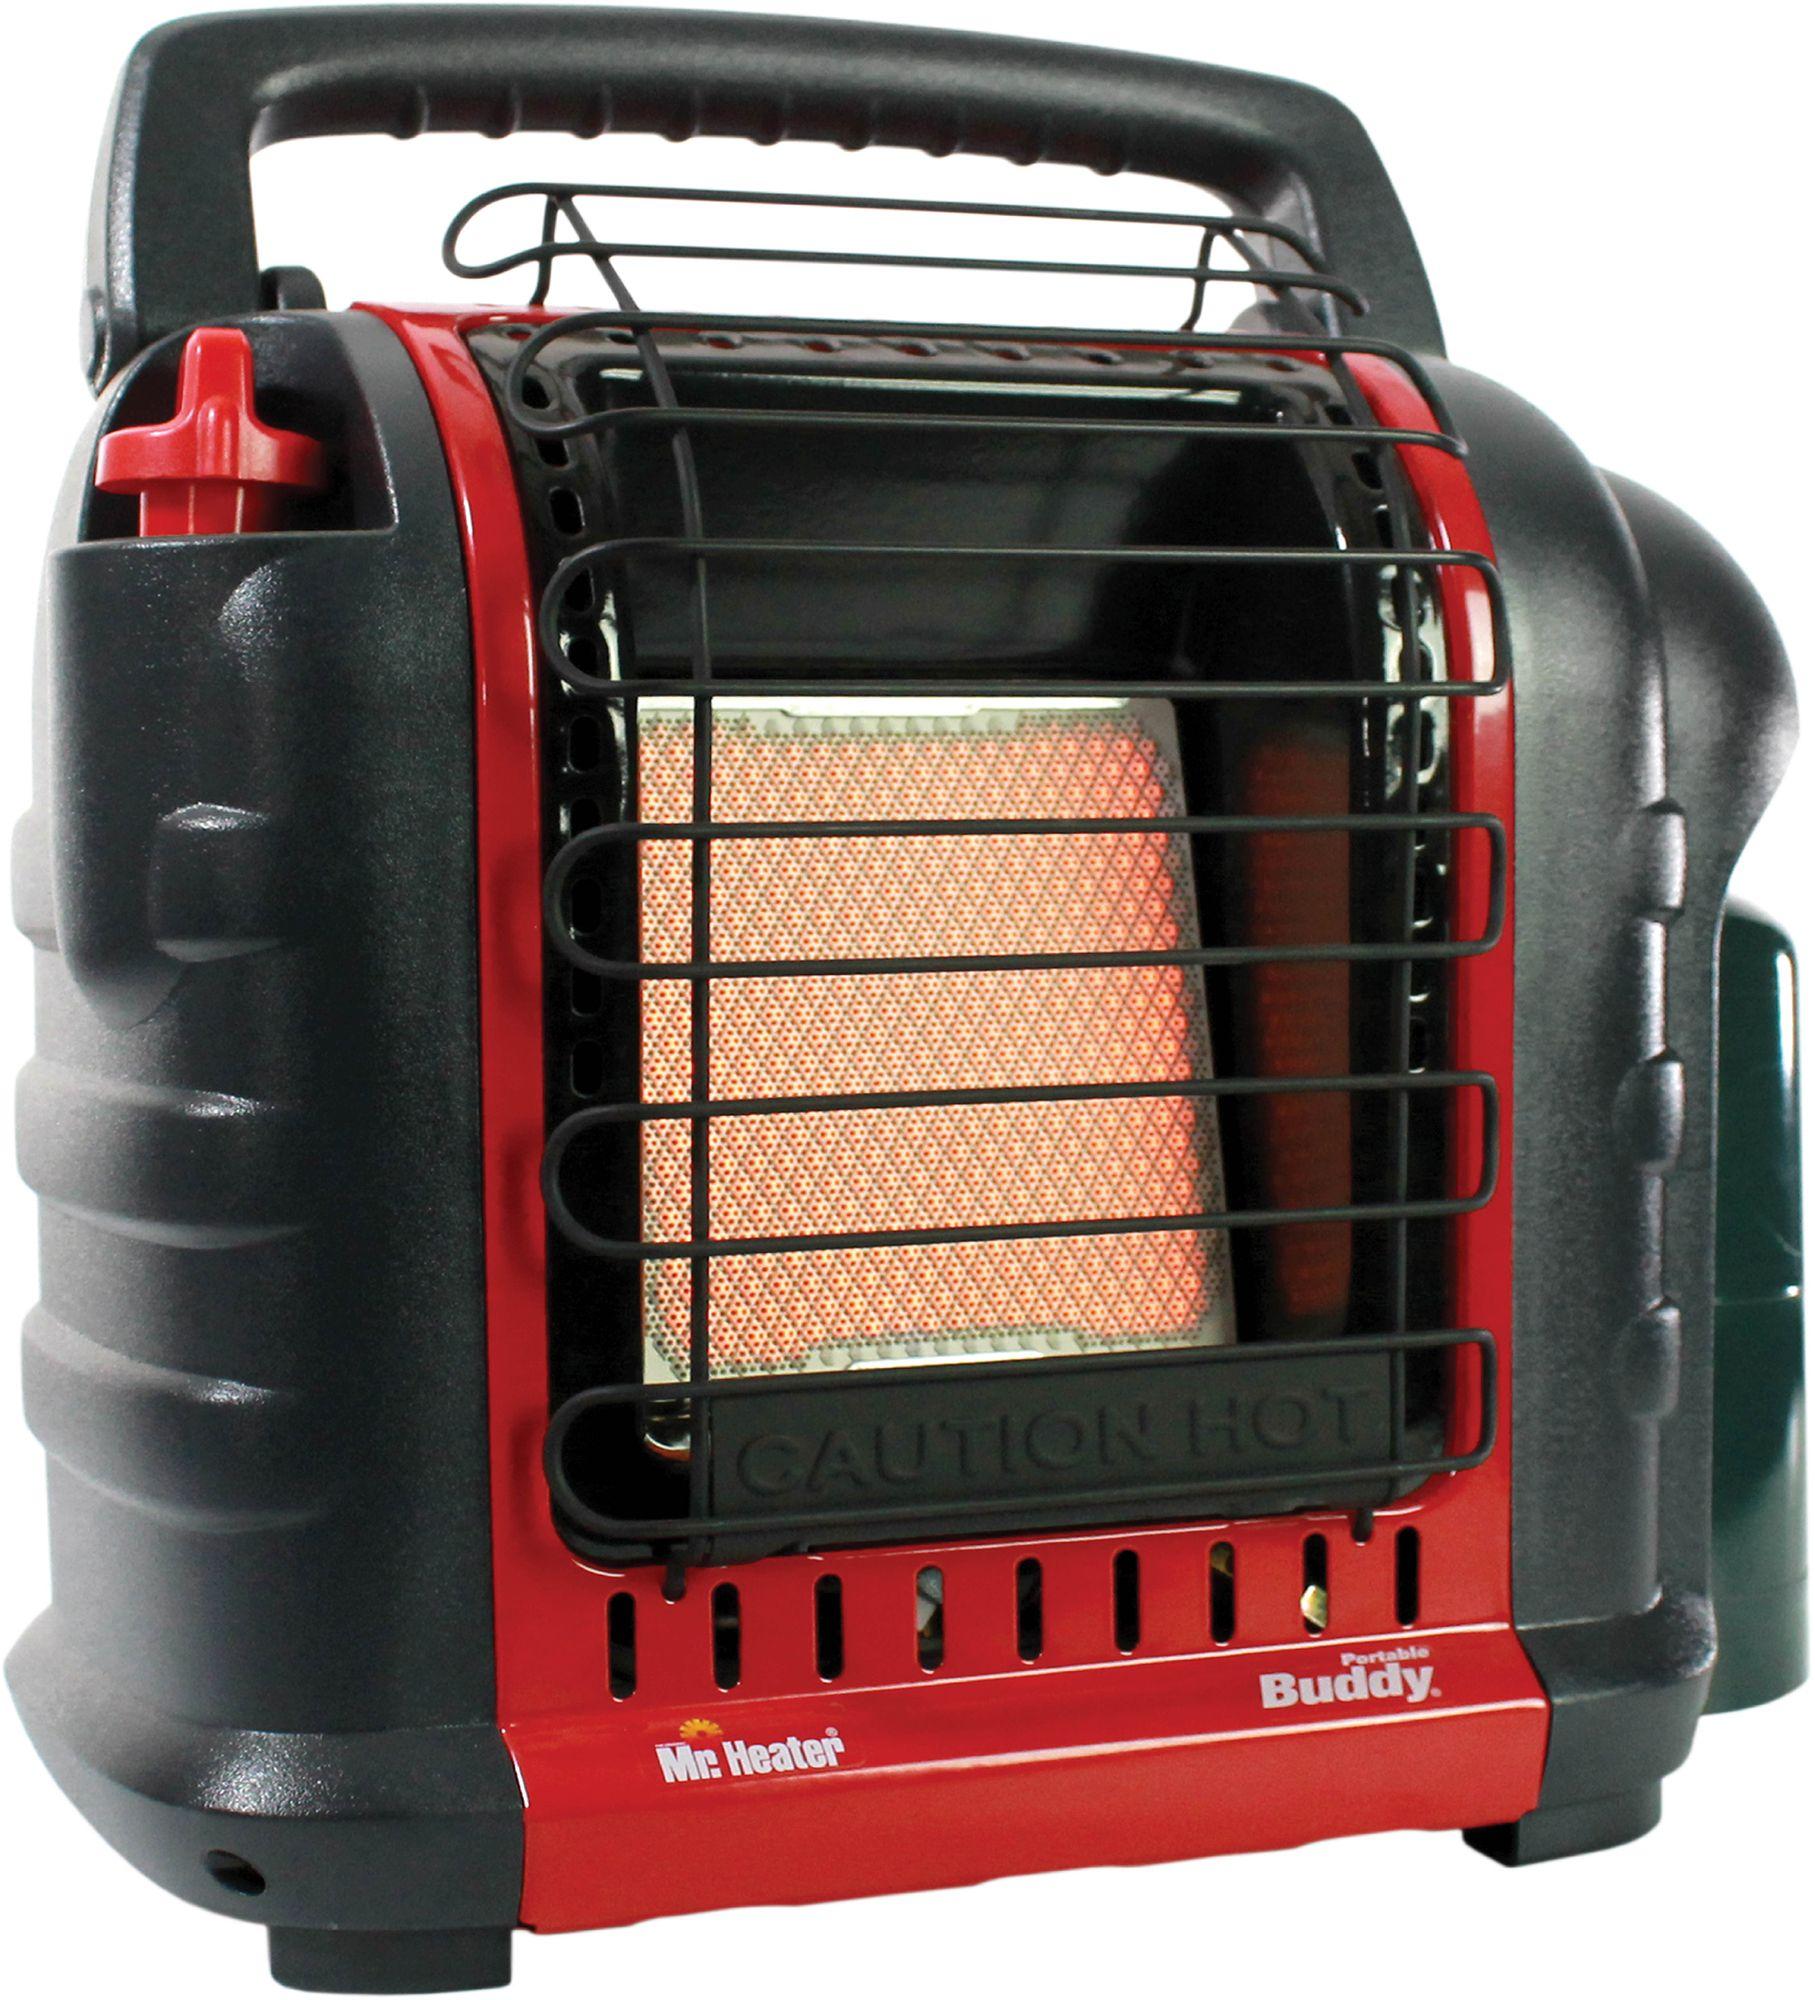 mr heater portable buddy heater field u0026 stream